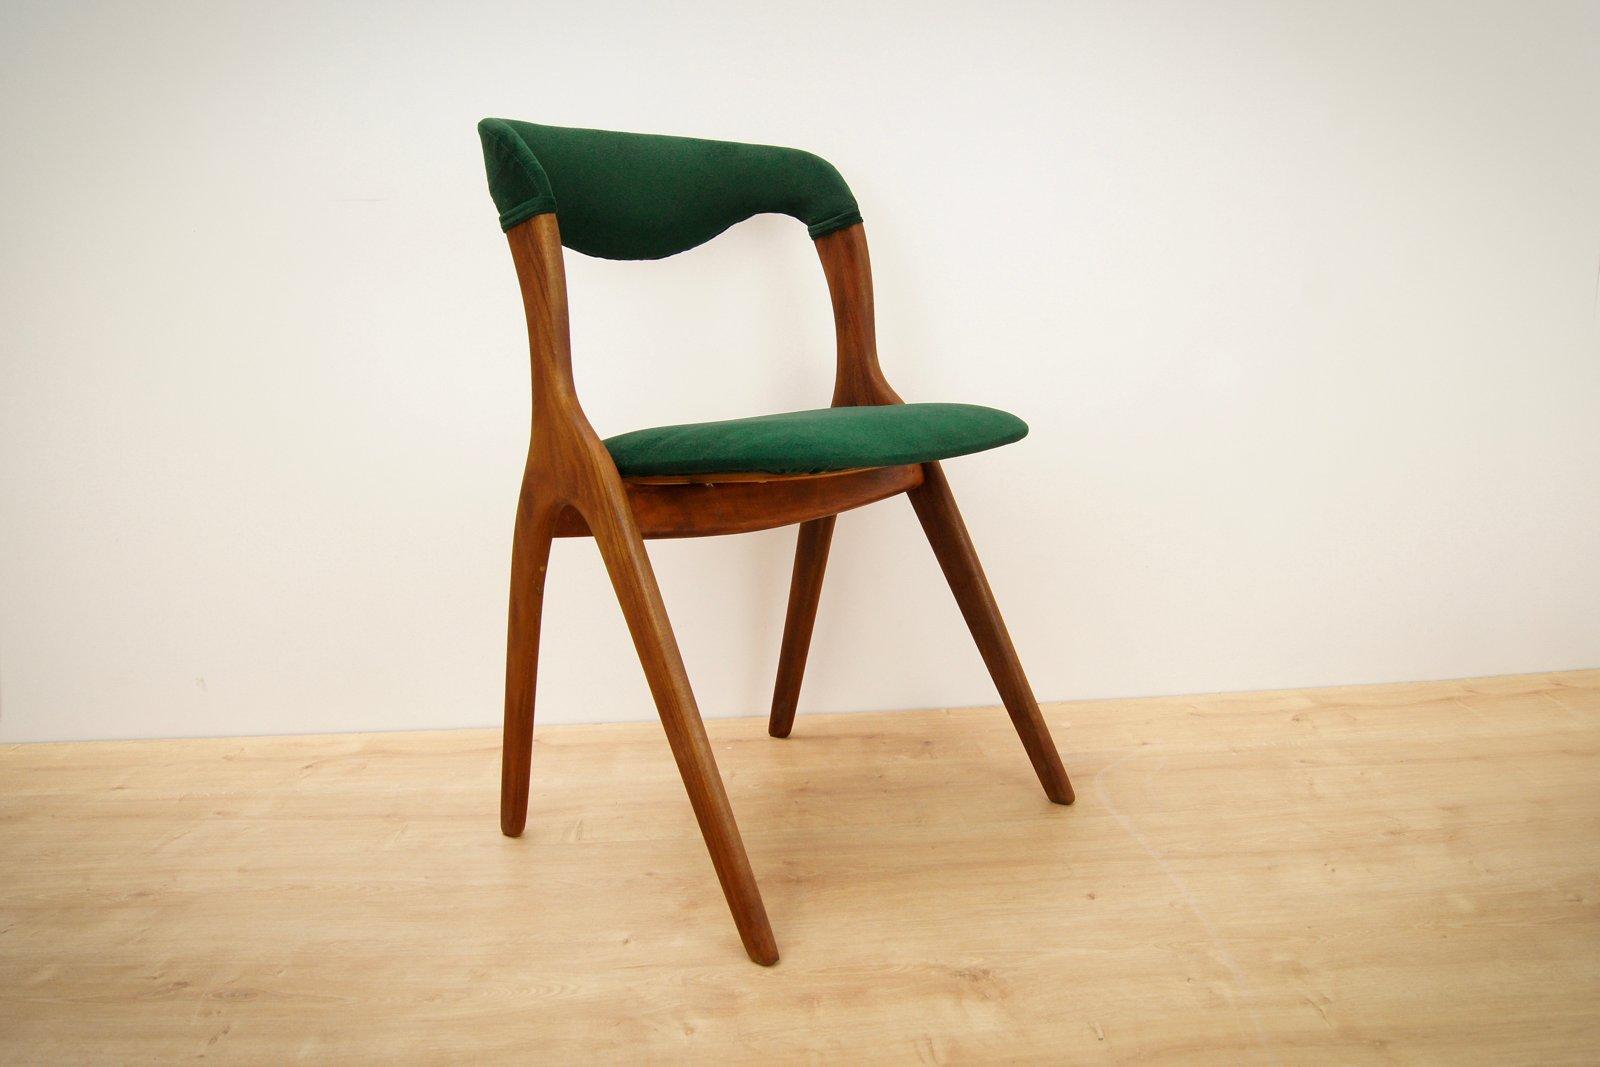 mid century stuhl von vamo sonderborg bei pamono kaufen. Black Bedroom Furniture Sets. Home Design Ideas